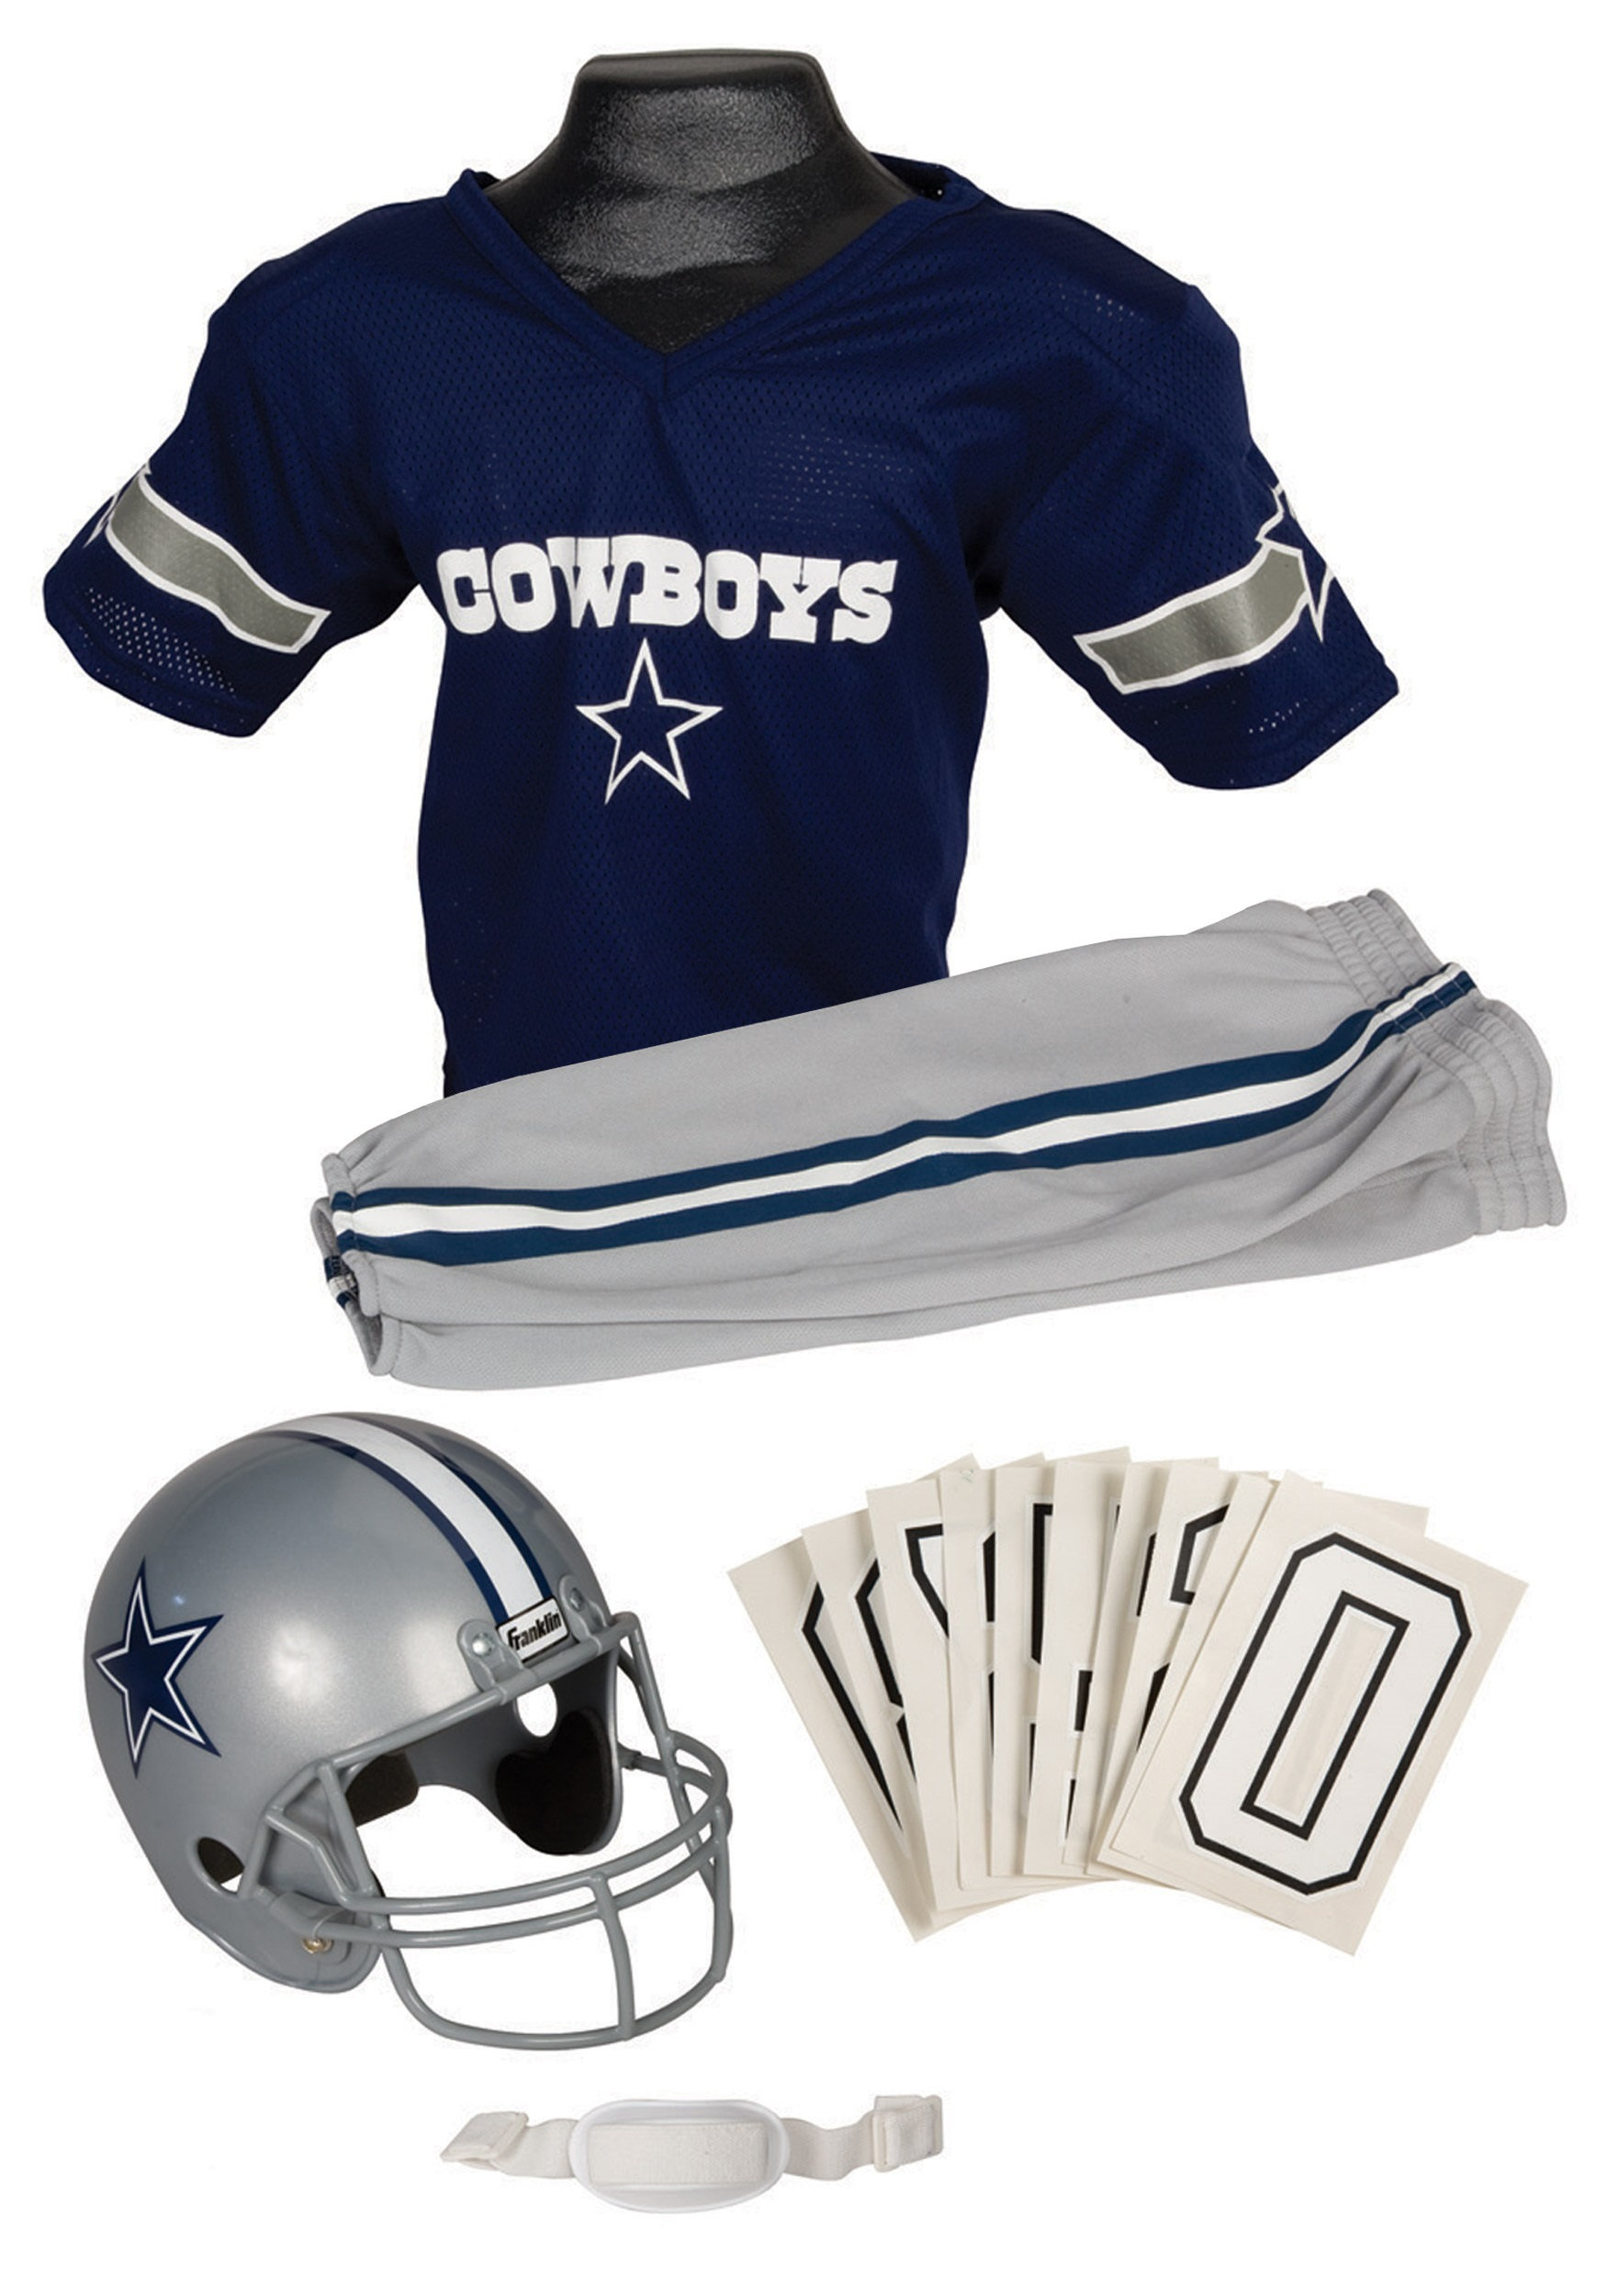 Cowboys Costumes For Females Nfl Cowboys Uniform Costume